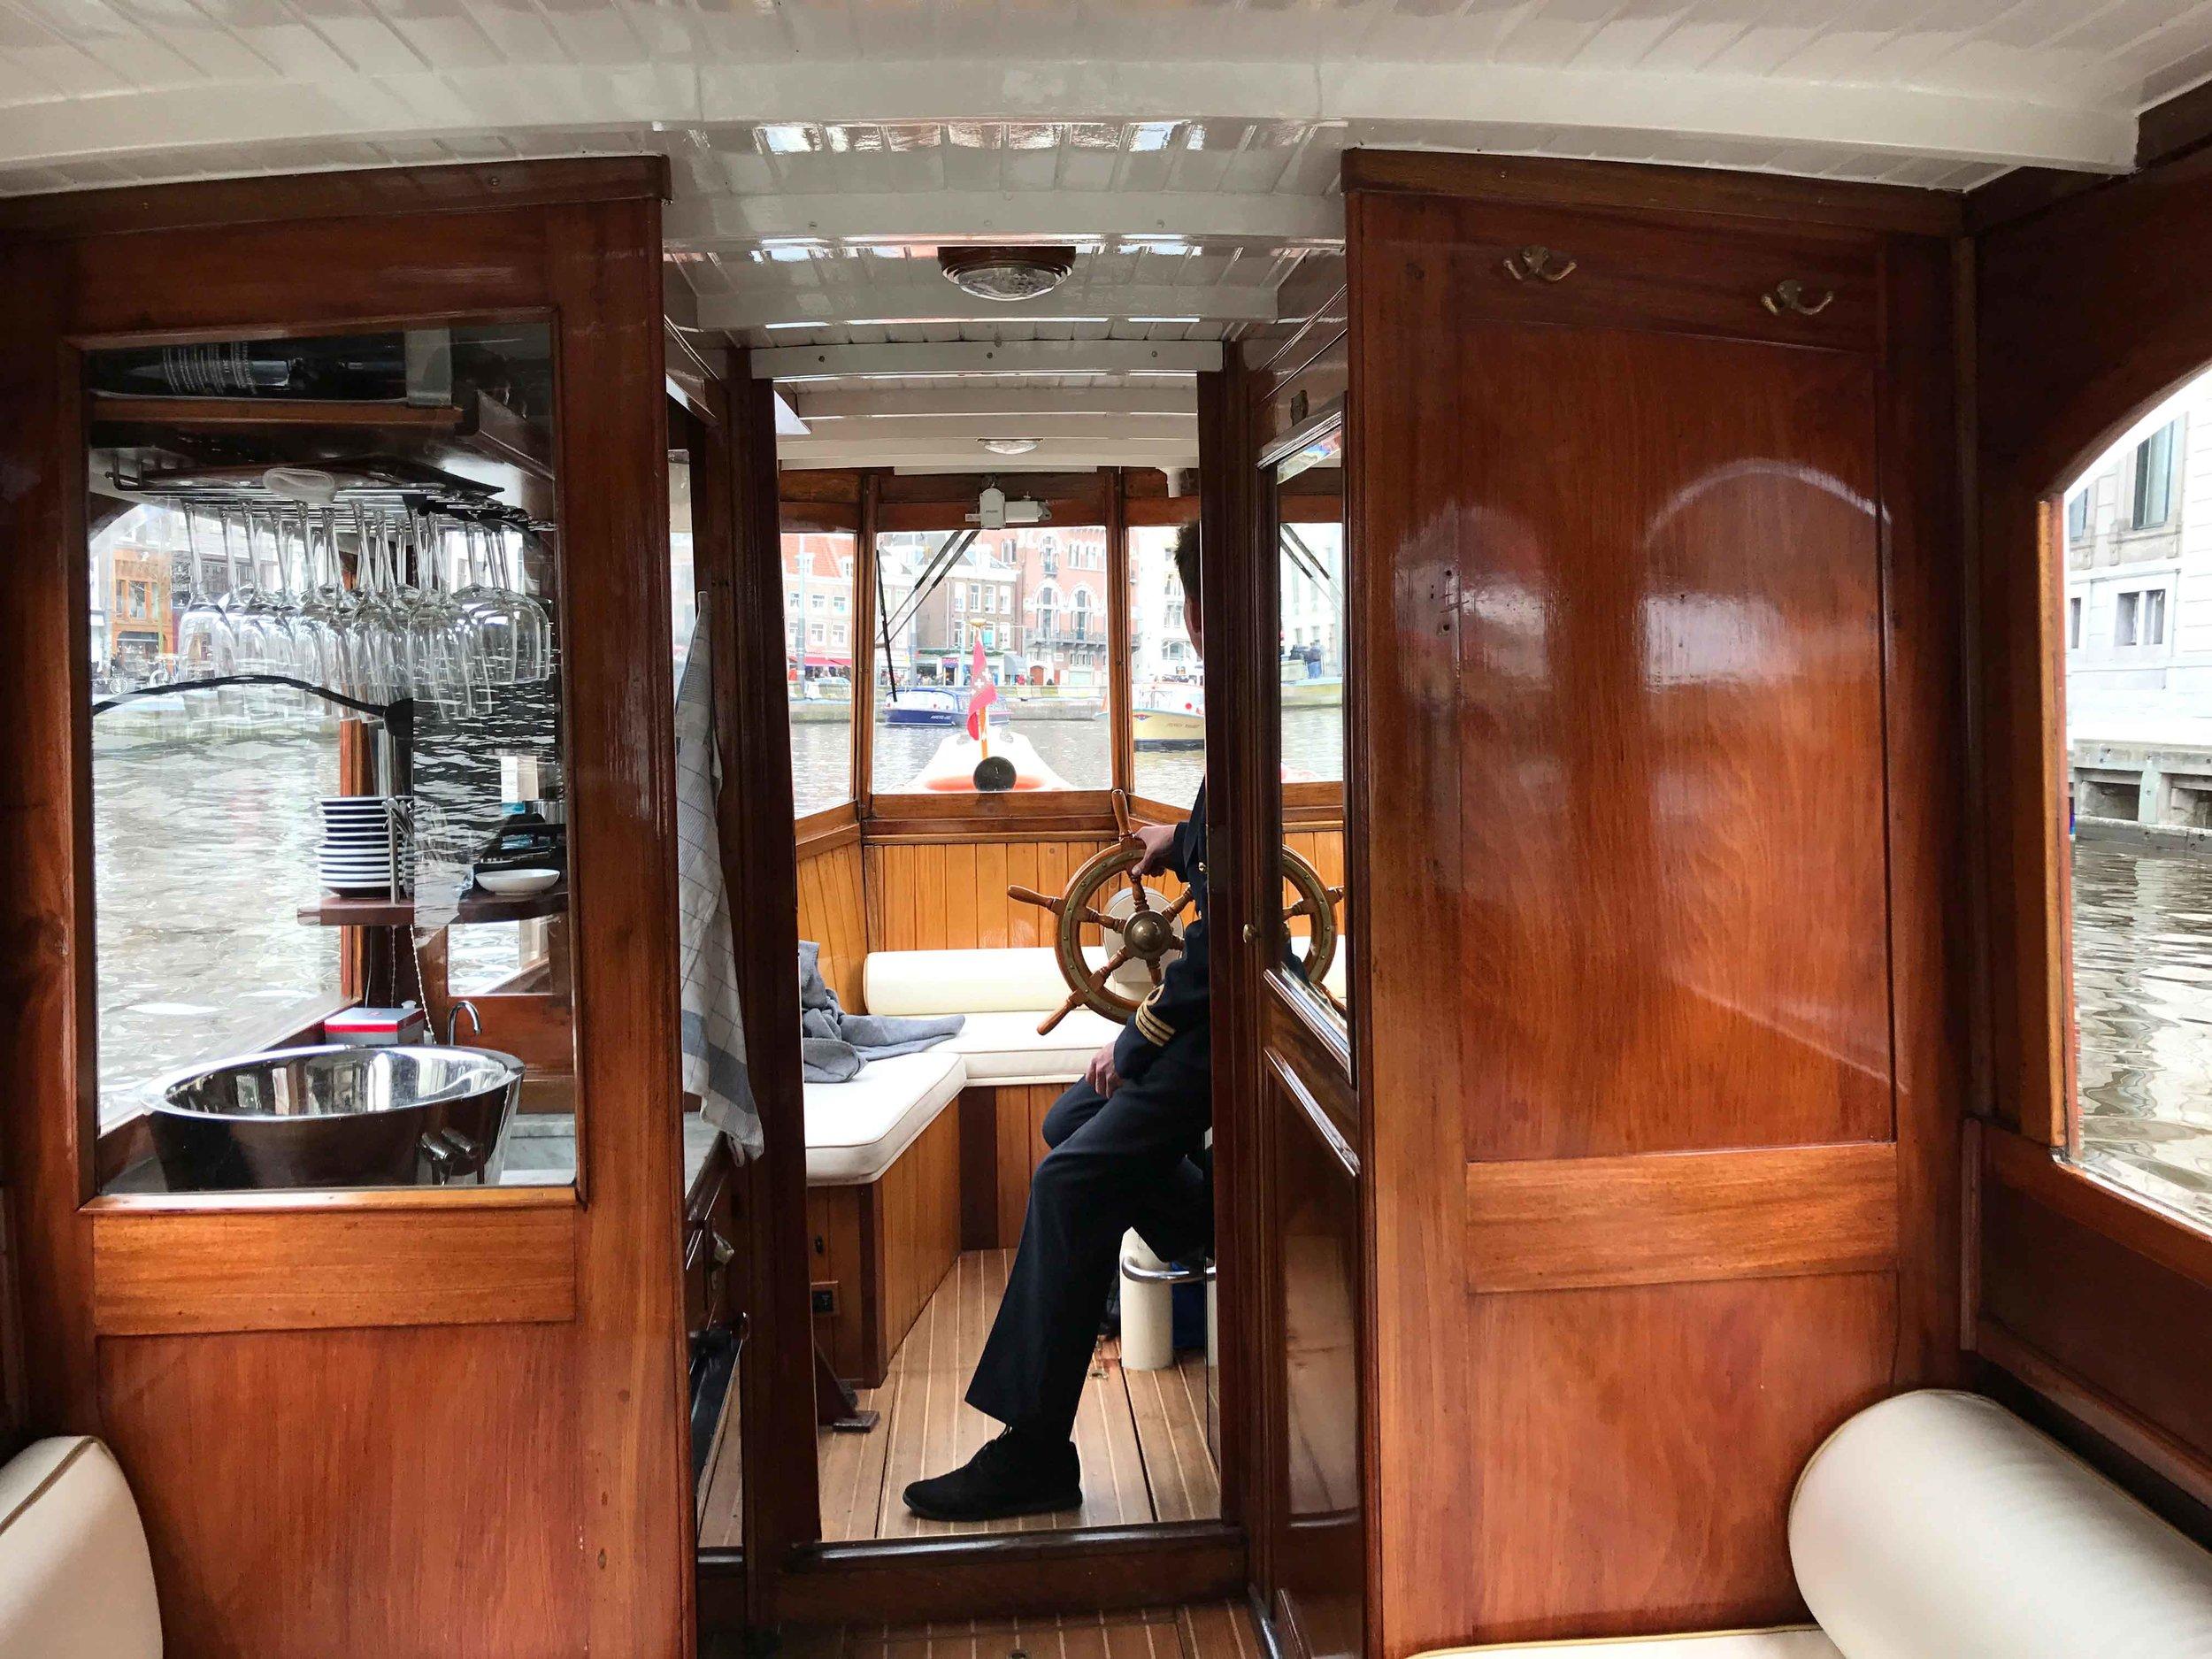 Grand Boat Tour, Sofitel Legend Amsterdam The Grand. Image©thingstodot.com